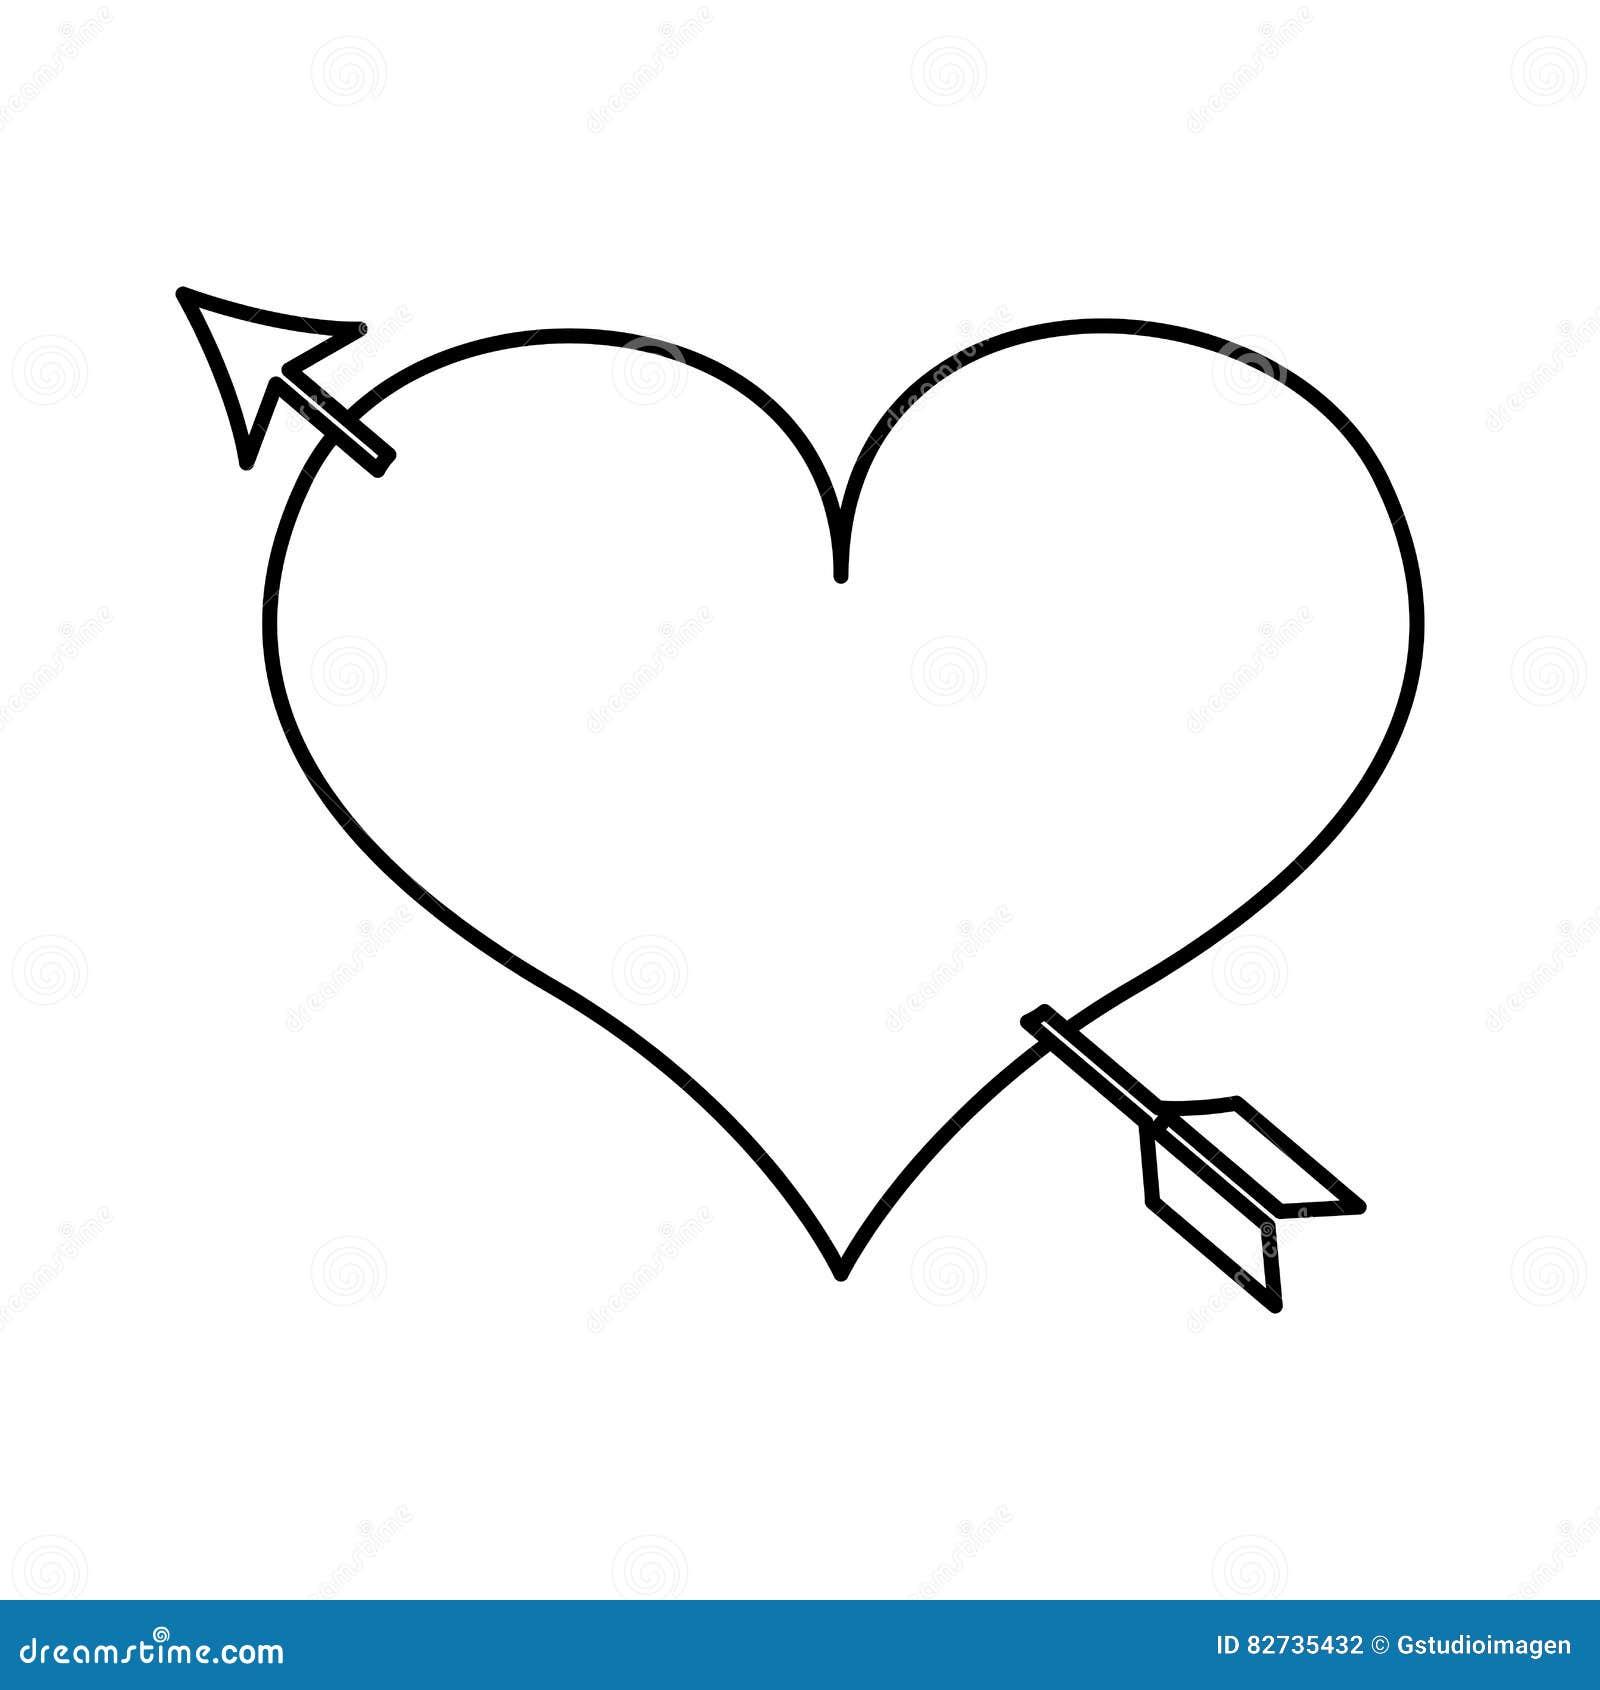 Dessin Rencontre Coeur Amour